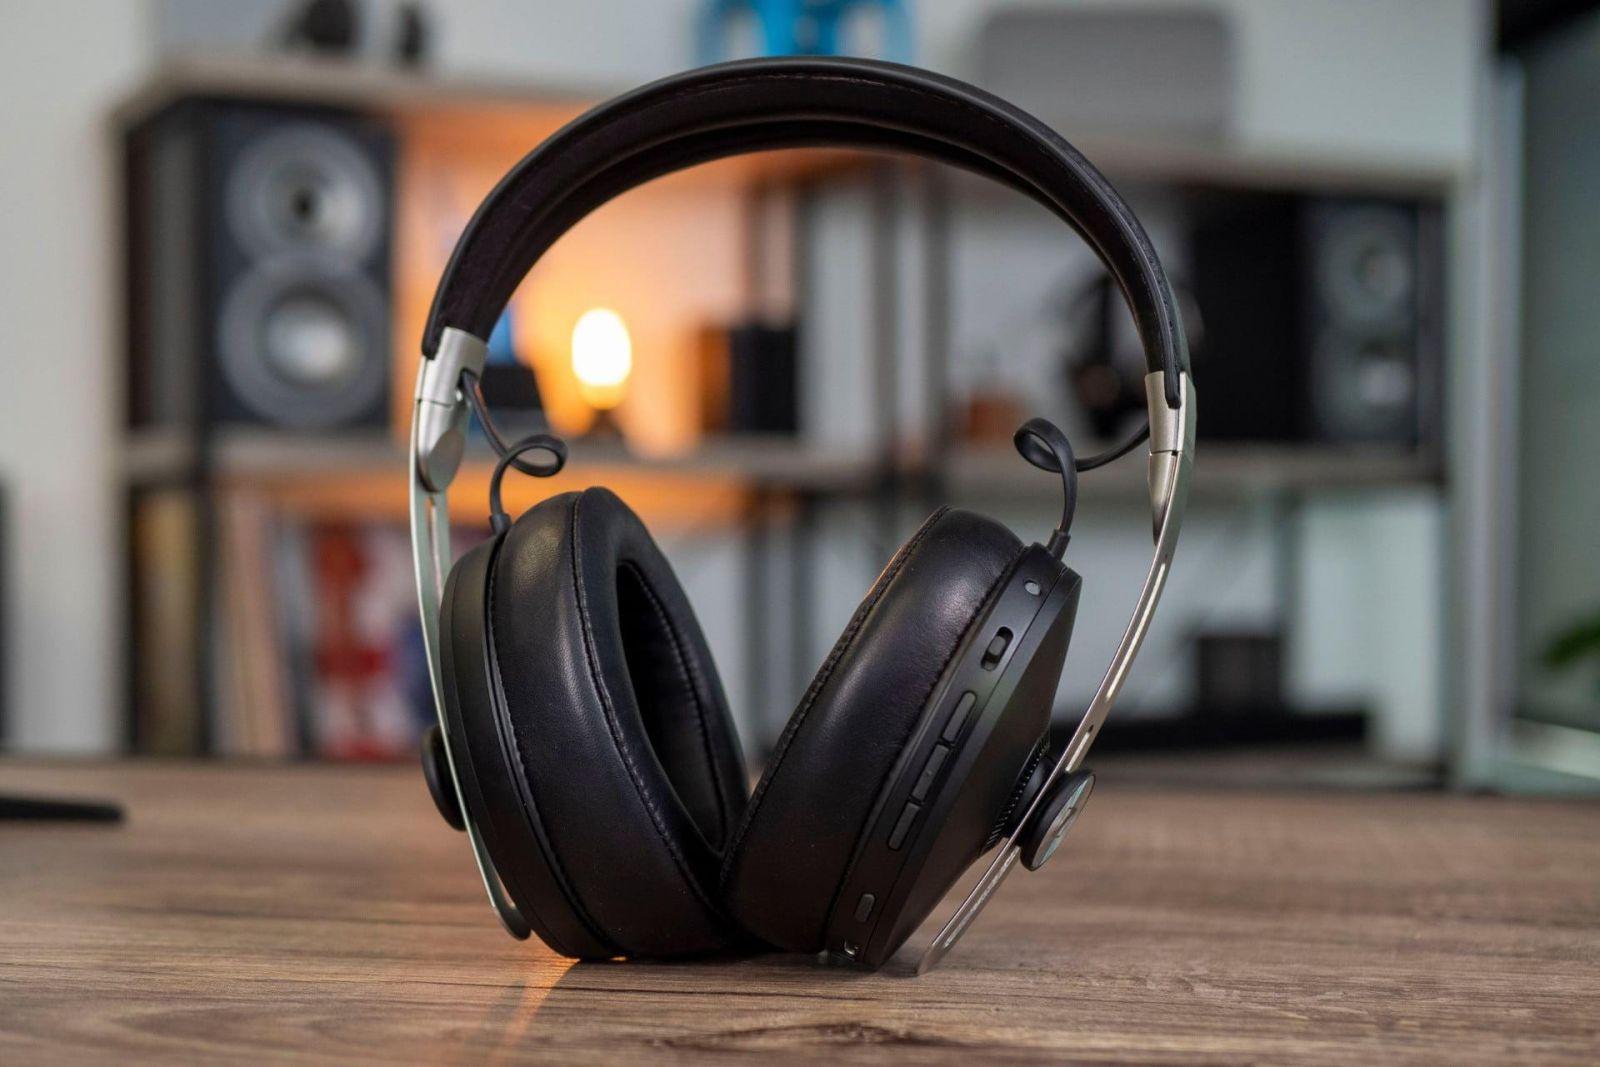 Sennheiser представила саундбар с технологией 3D-звучания и улучшенные наушники (sennheiser momentum 3 full headphones header)